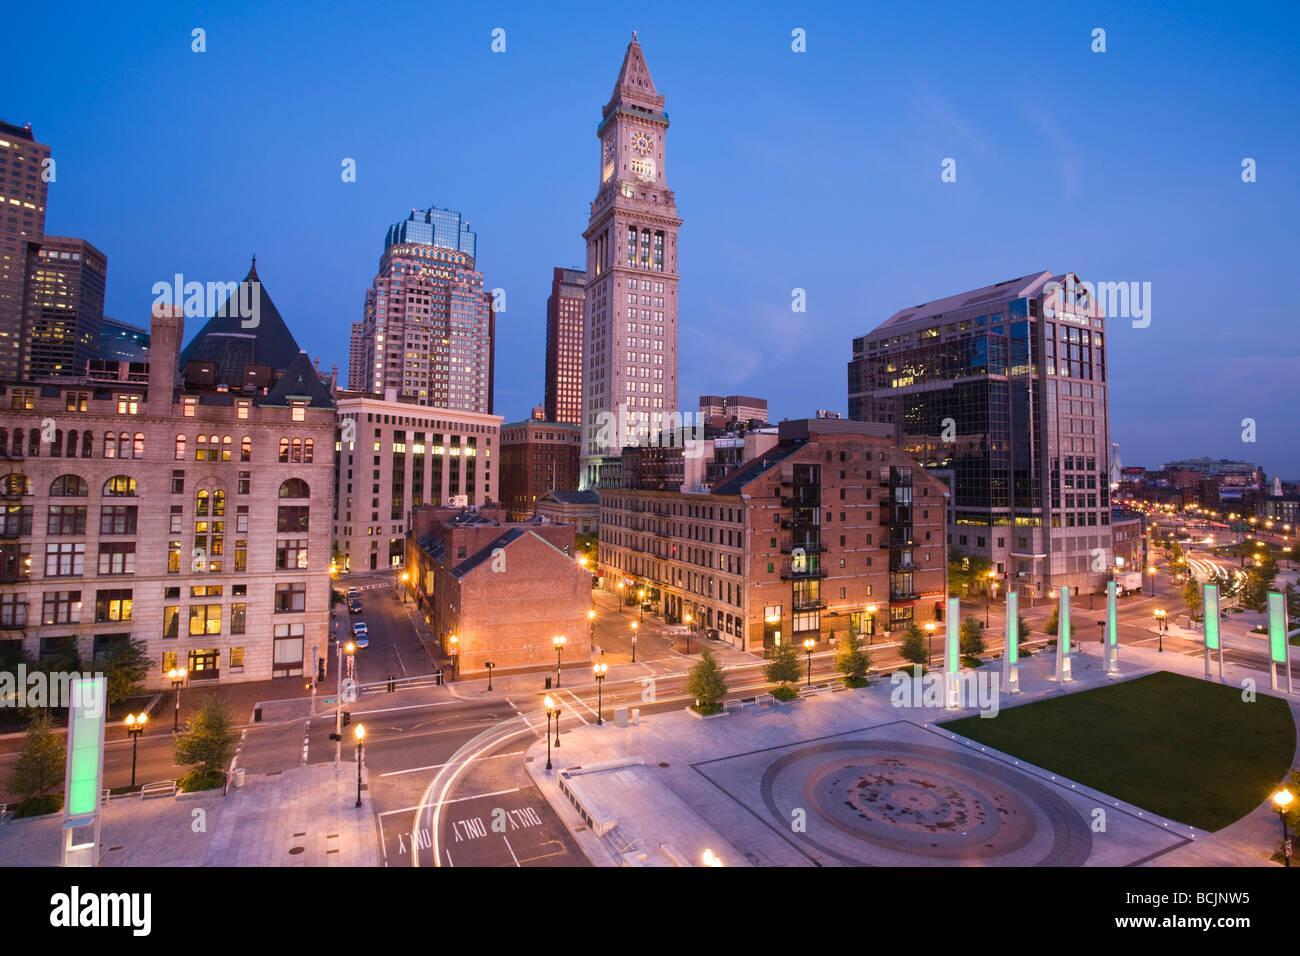 USA, Massachusetts, Boston, Atlantic Avenue Greenway and Customs House - Stock Image